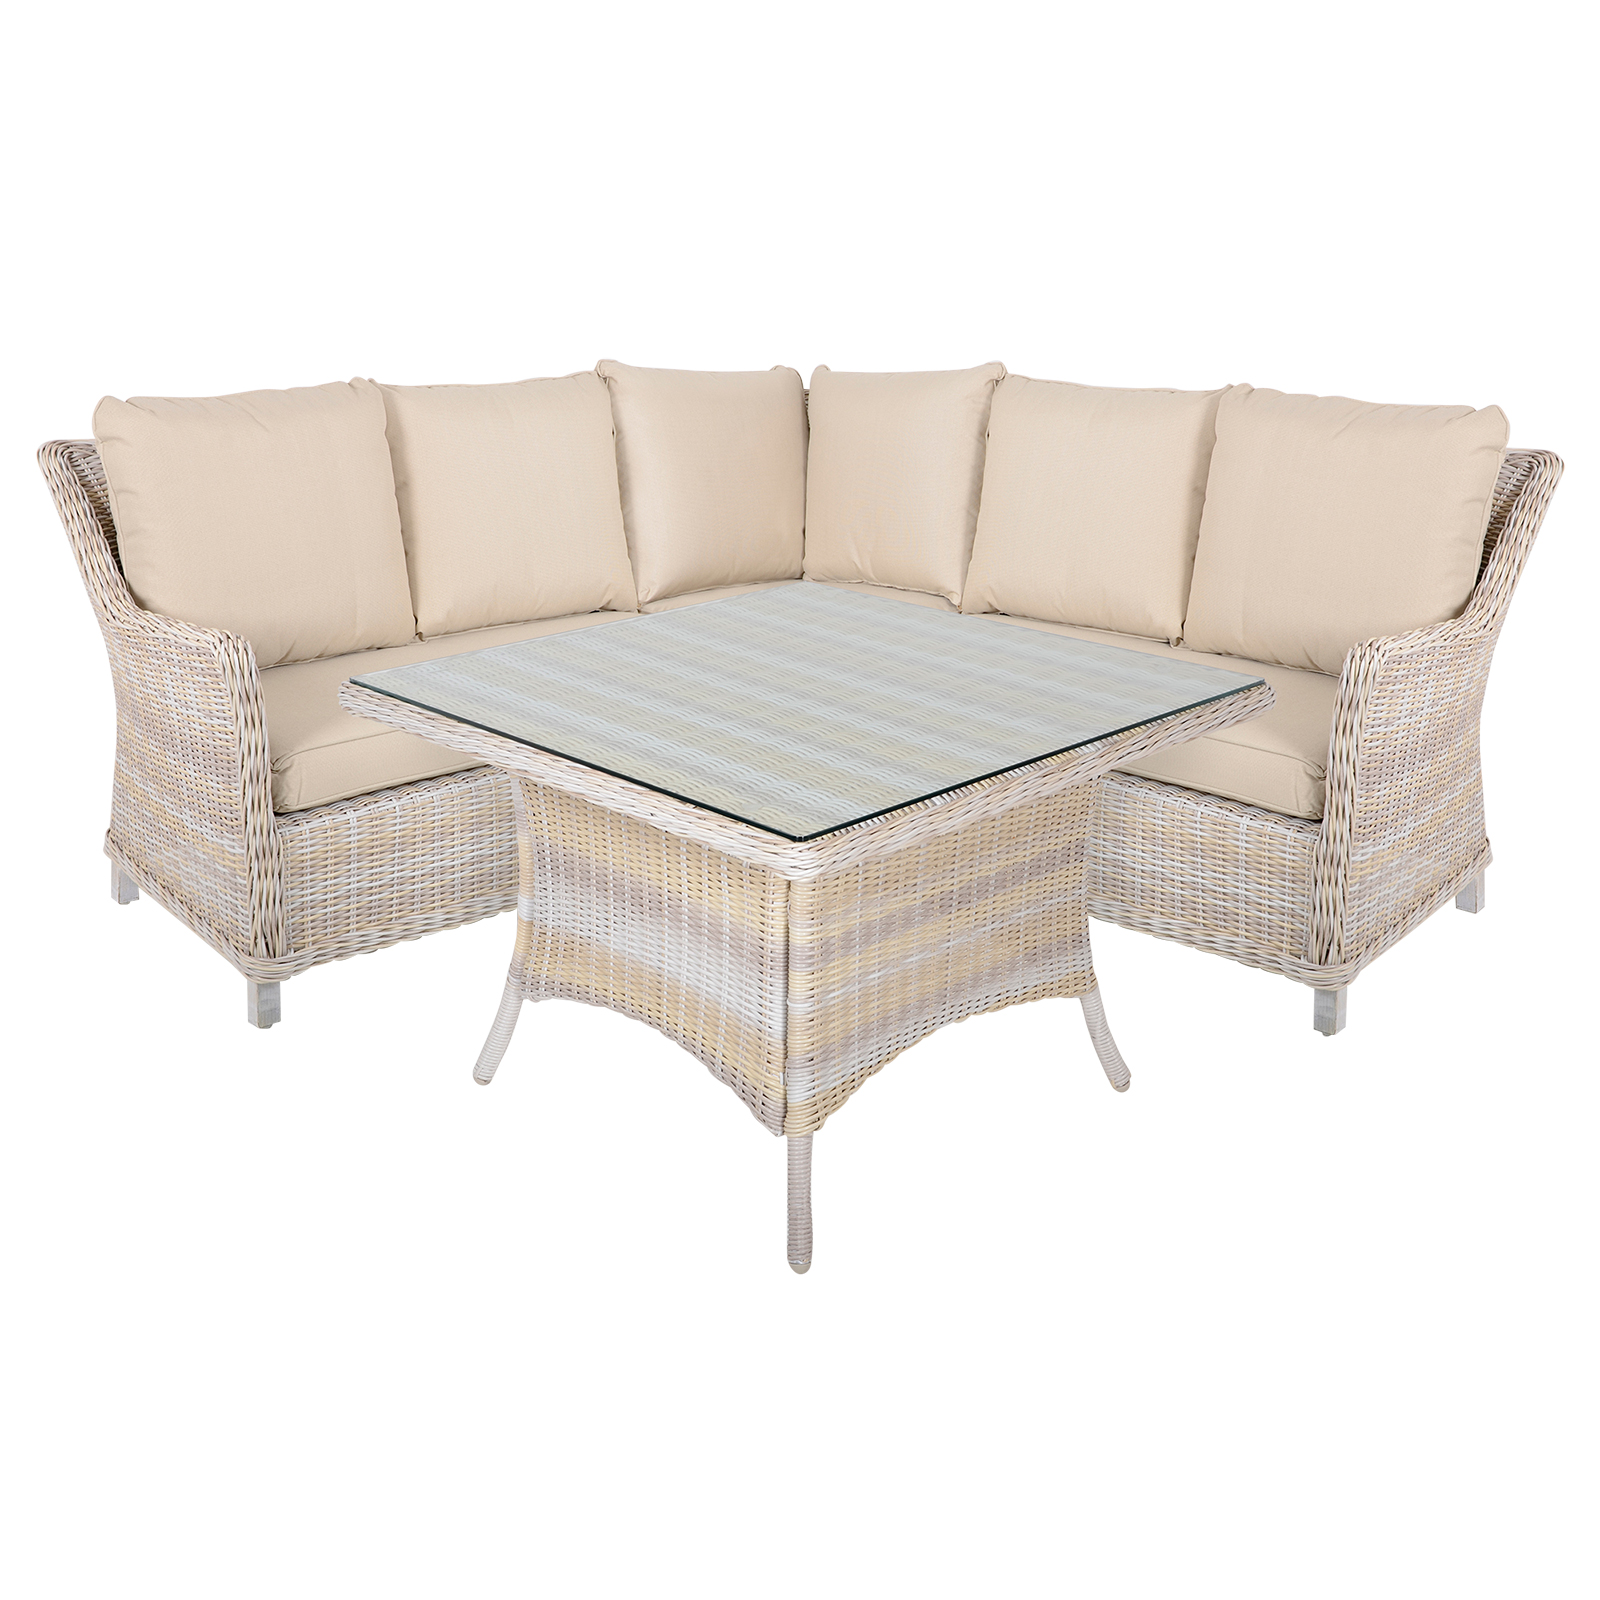 Sofa Corner Table Online: Garden Rattan Barbados Furniture Patio Outdoor Lounge